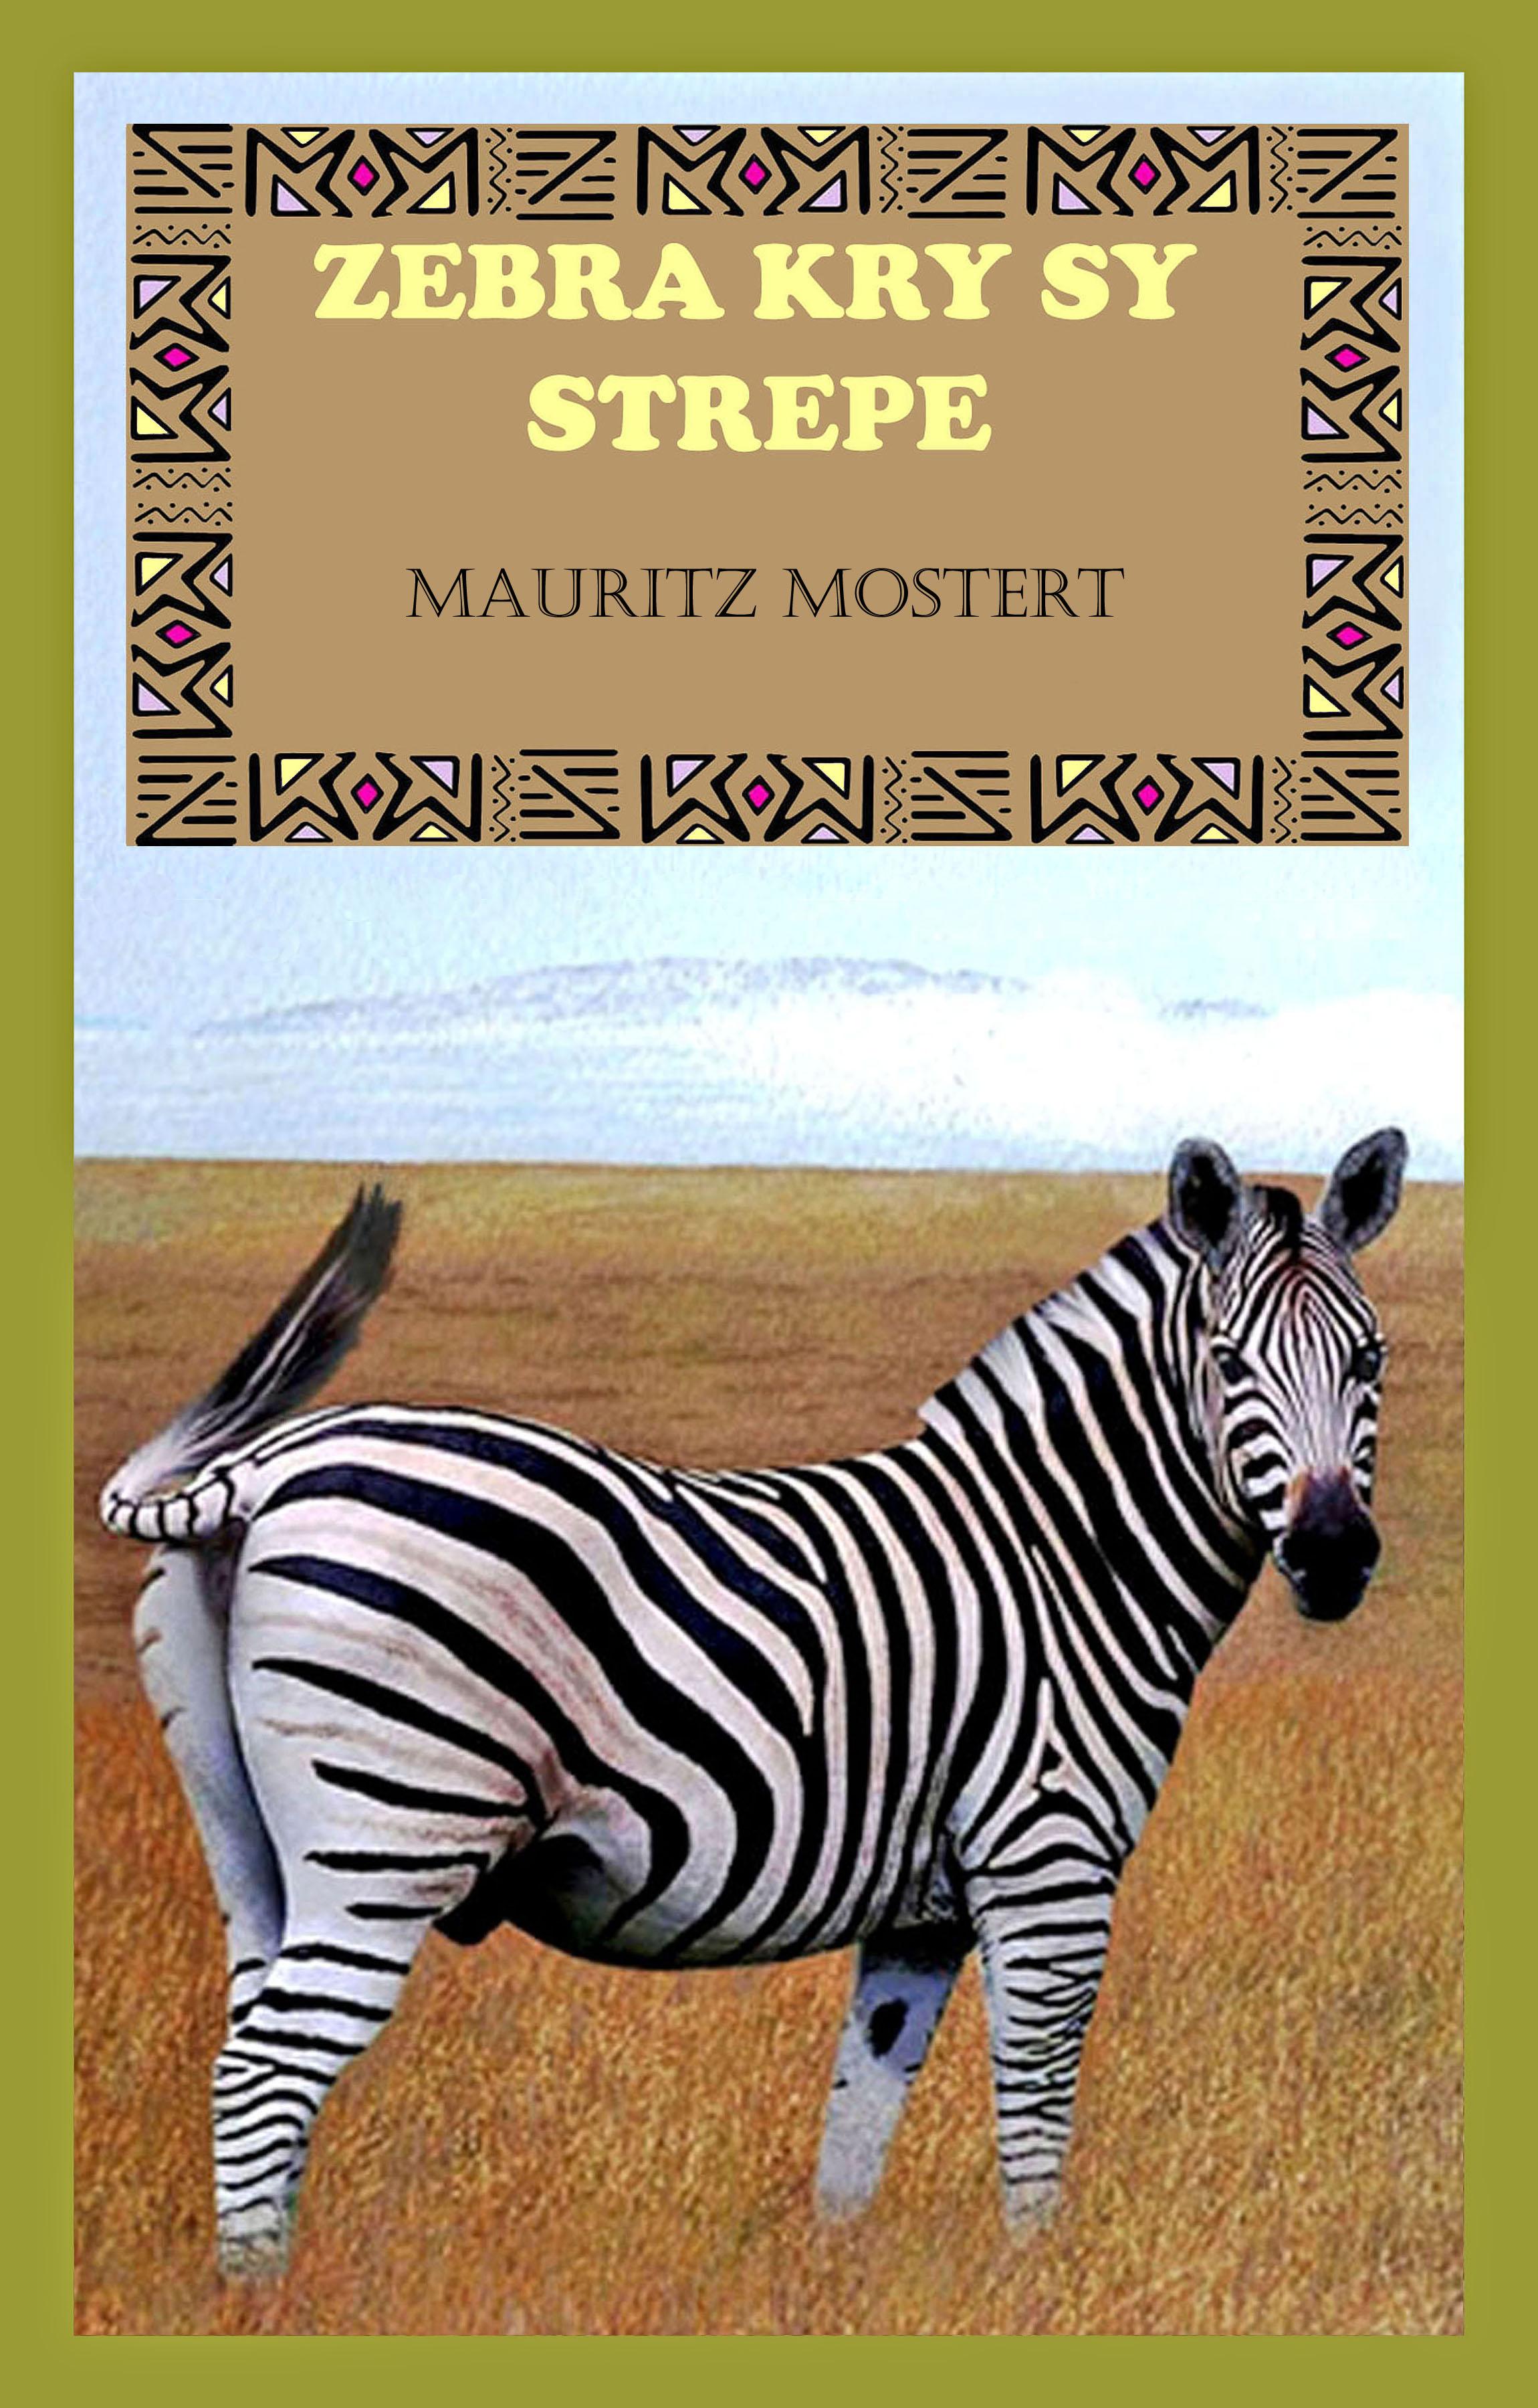 Zebra-Afrikaans-Zebra-Kry-Sy-Strepe